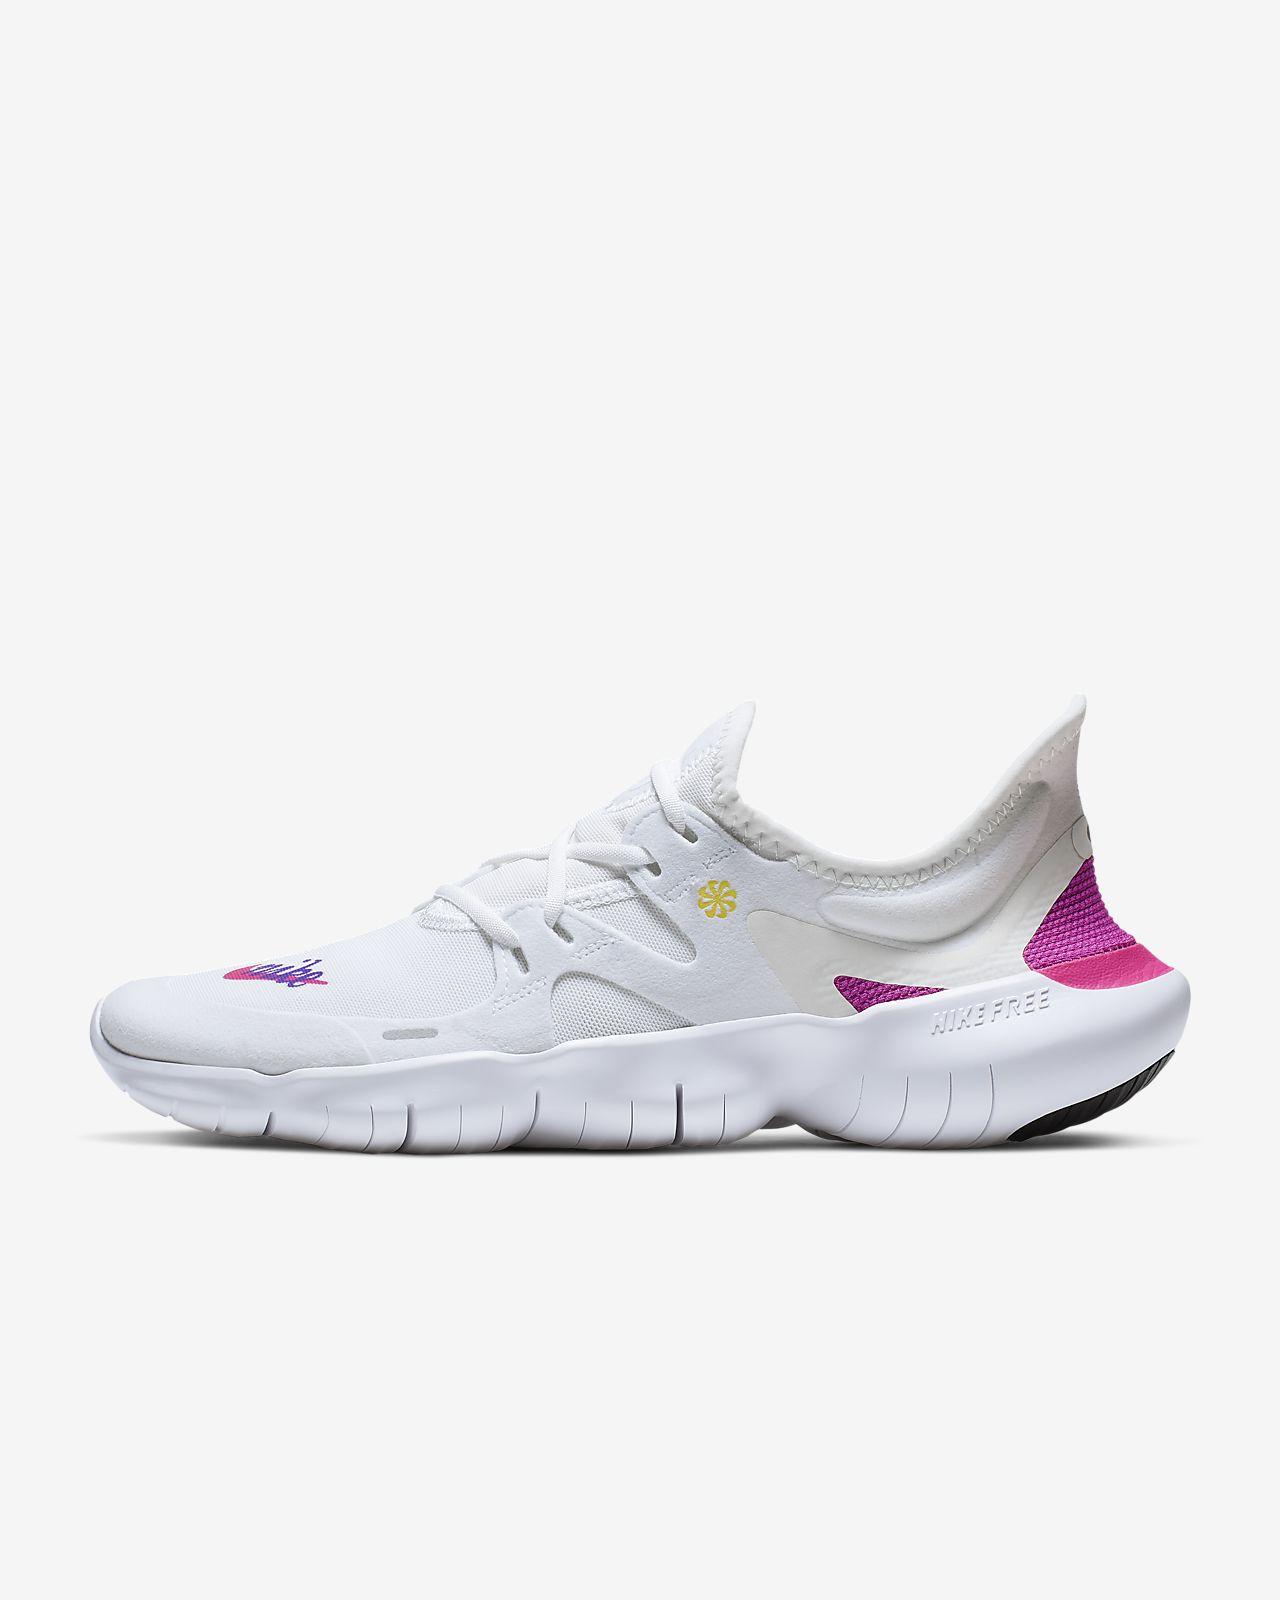 meilleur pas cher 09474 1f33b Chaussure de running Nike Free RN 5.0 pour Femme